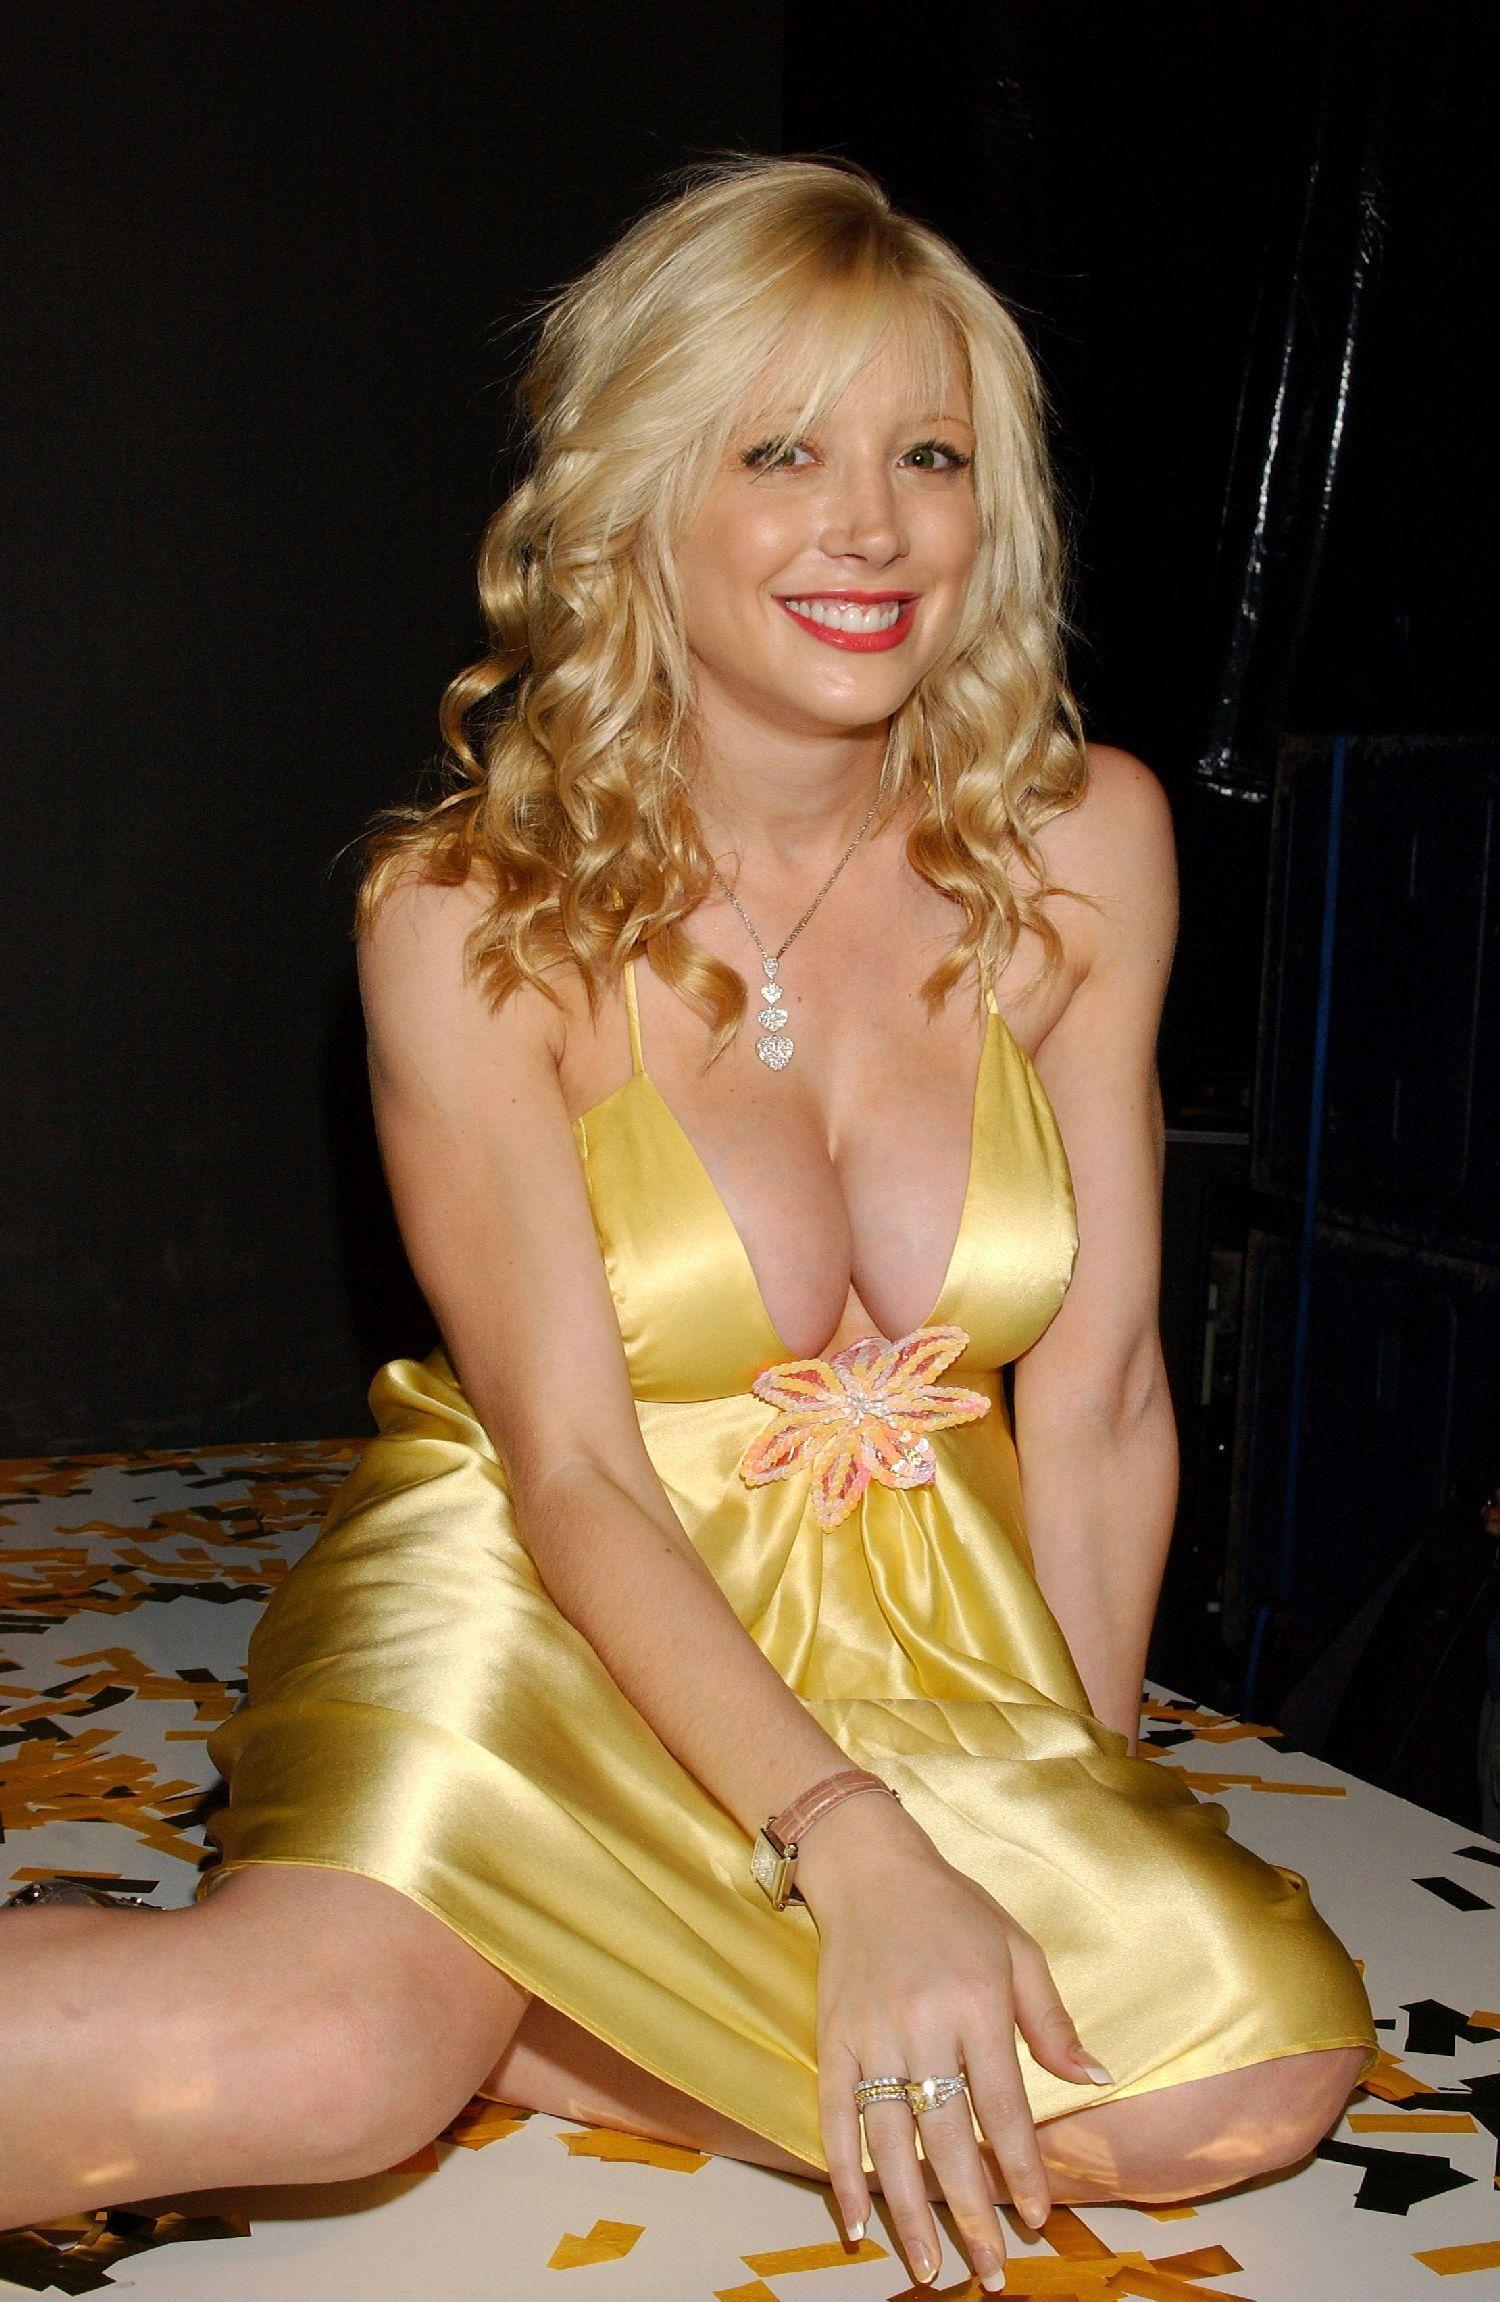 Penelope Wilton (born 1946),Kathryn Doby Erotic video Yuan Li,Marg Helgenberger born November 16, 1958 (age 59)